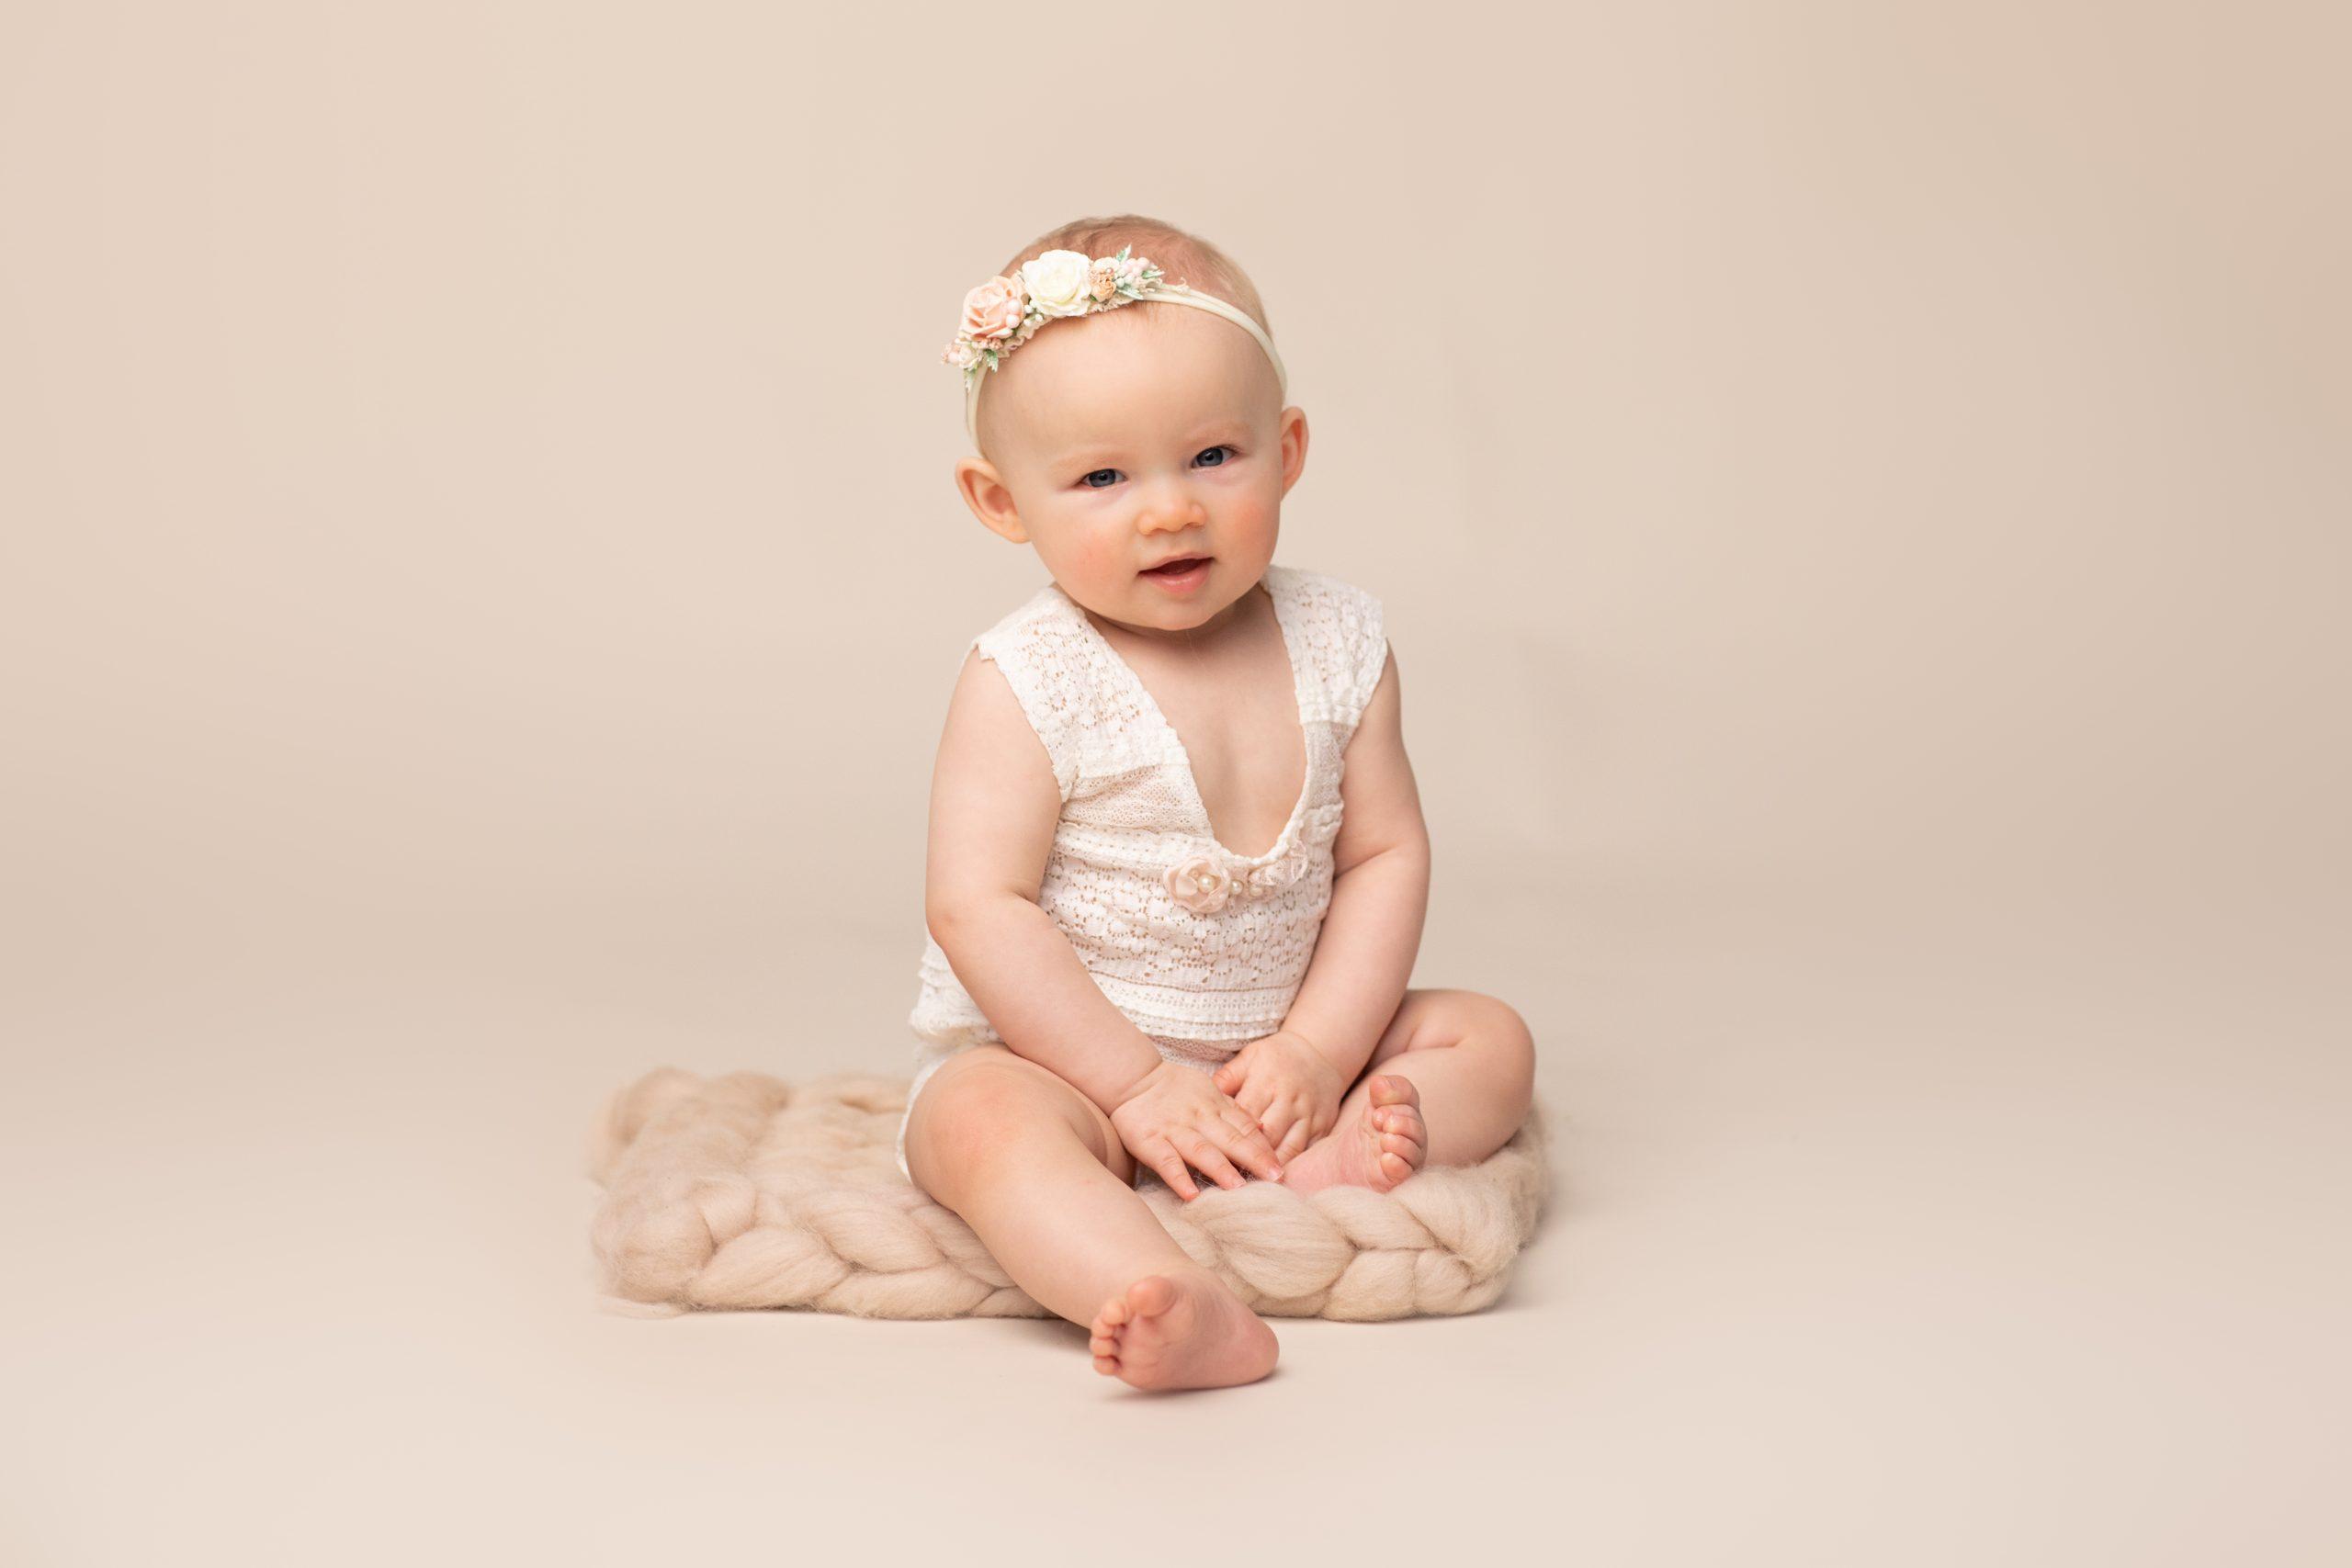 Baby sitter fotoshoot in fotostudio eye flash